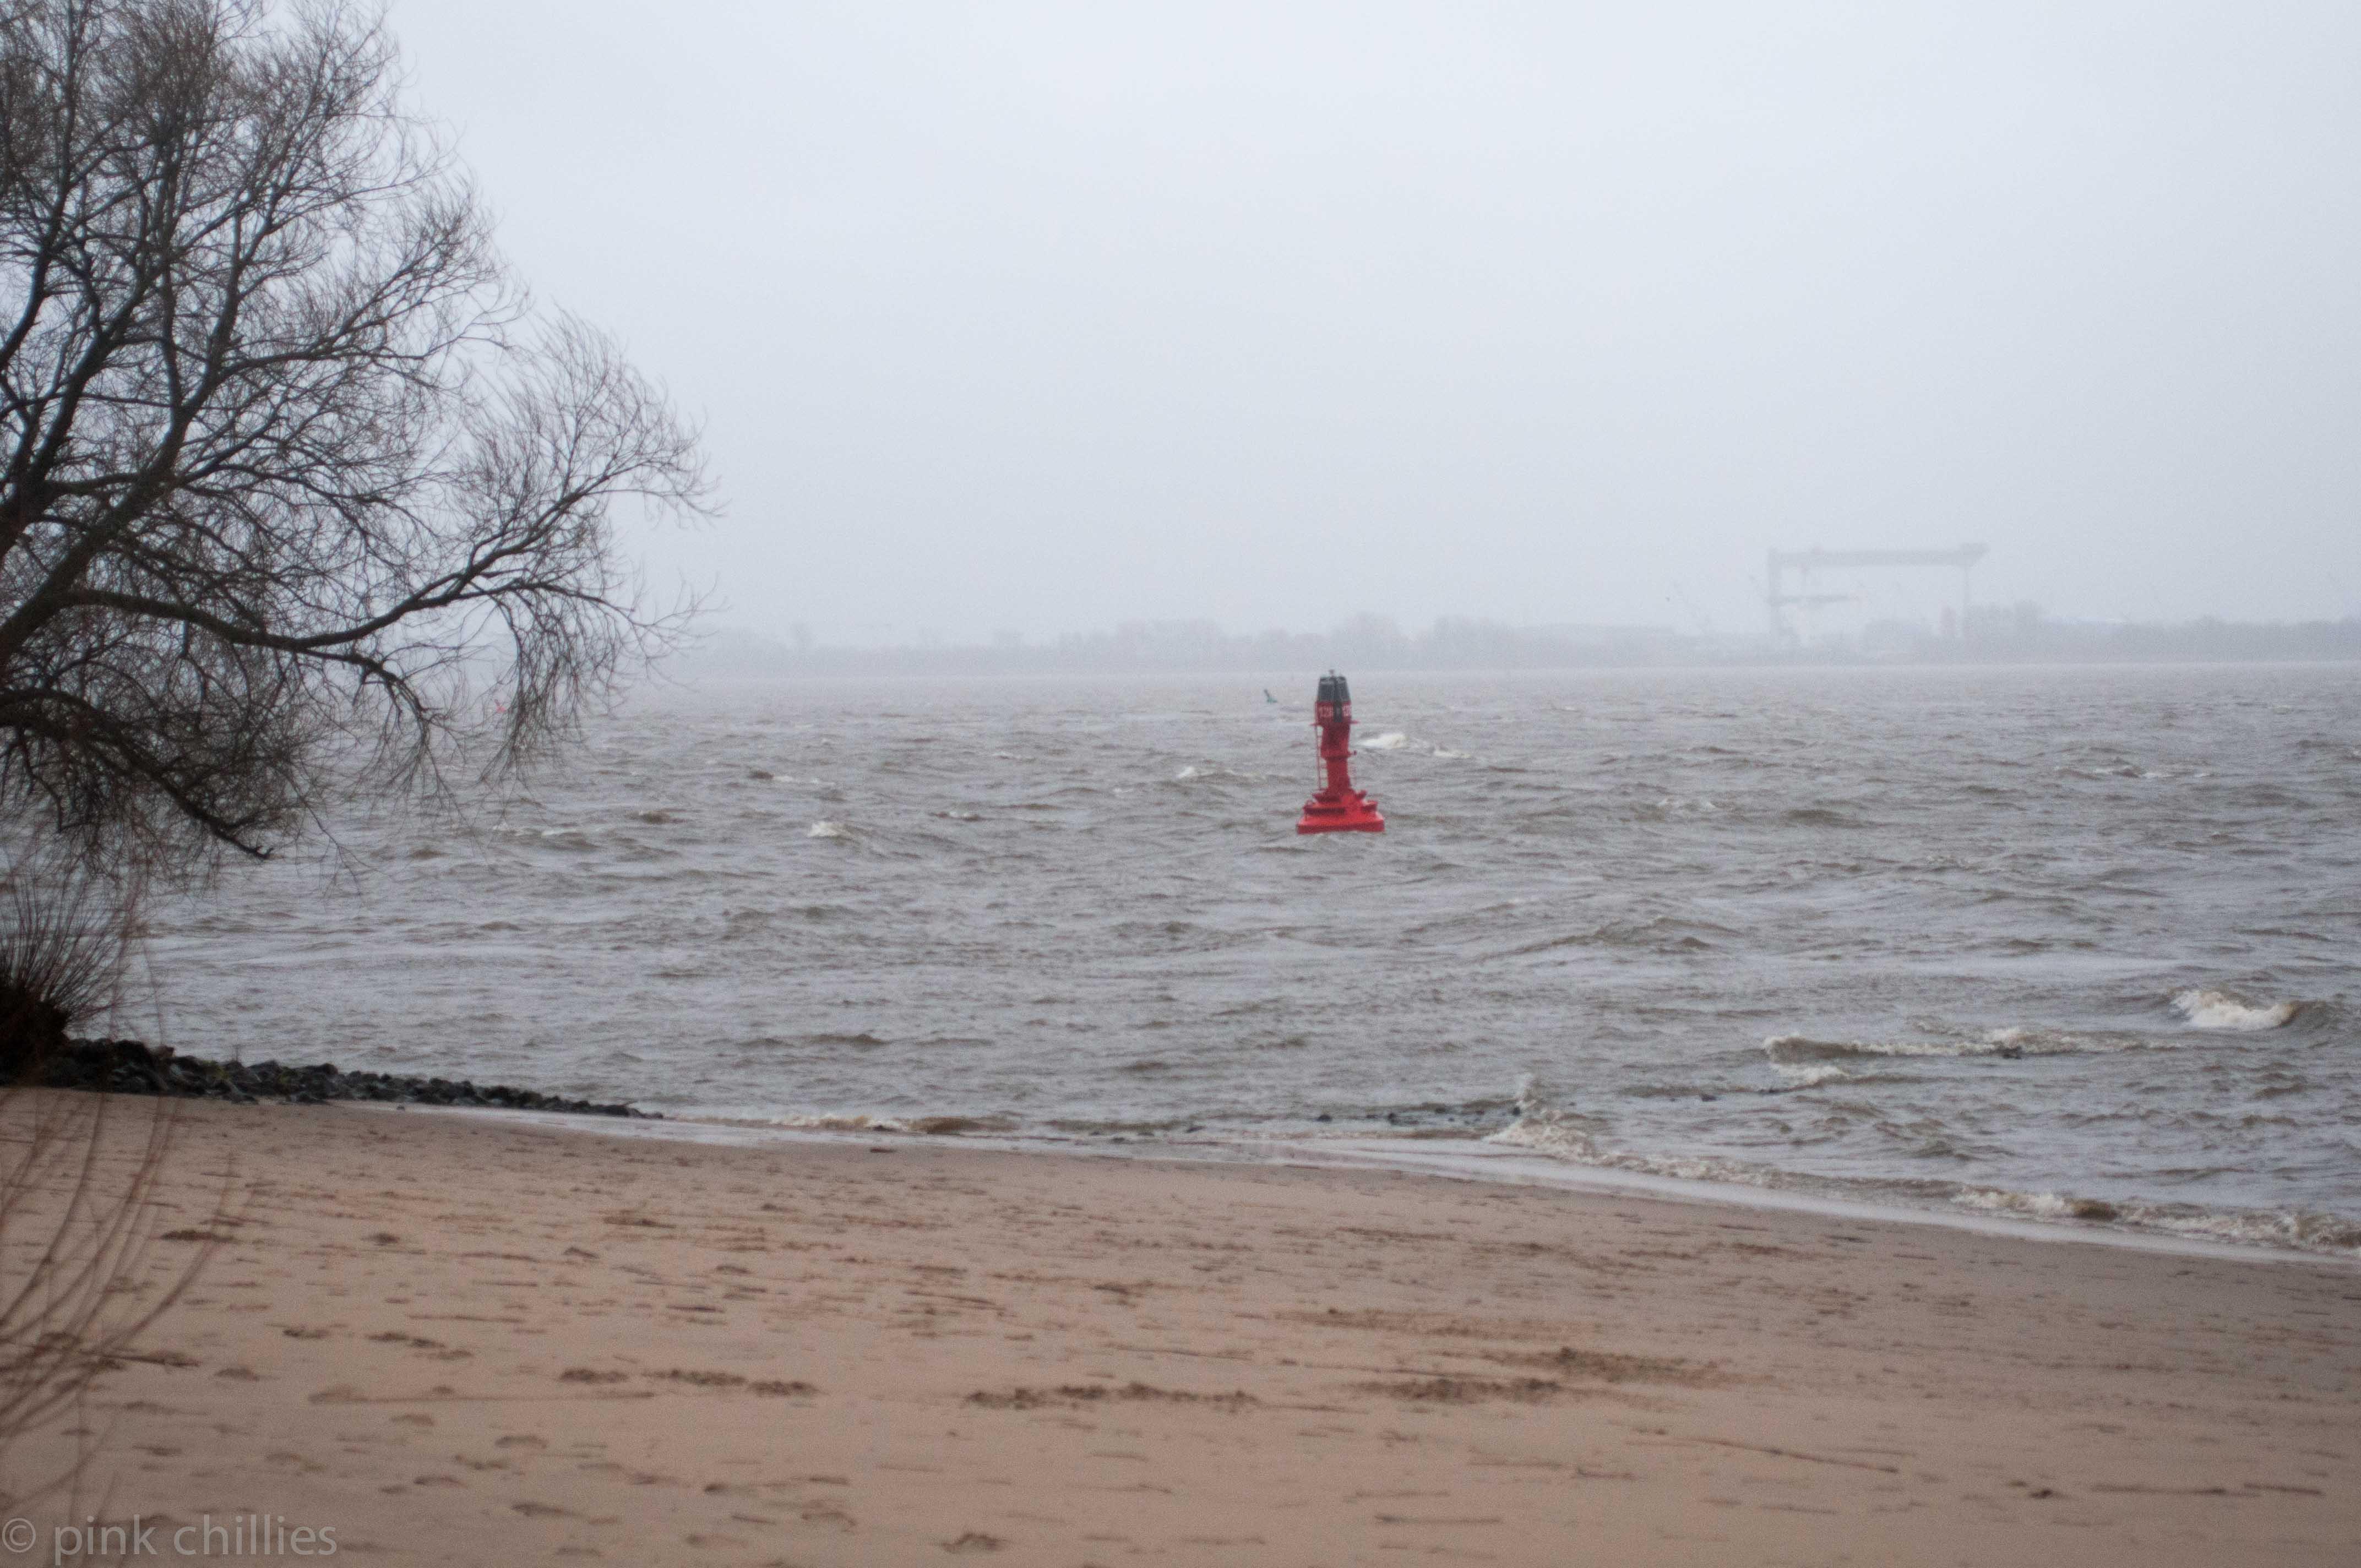 Boje auf Elbe